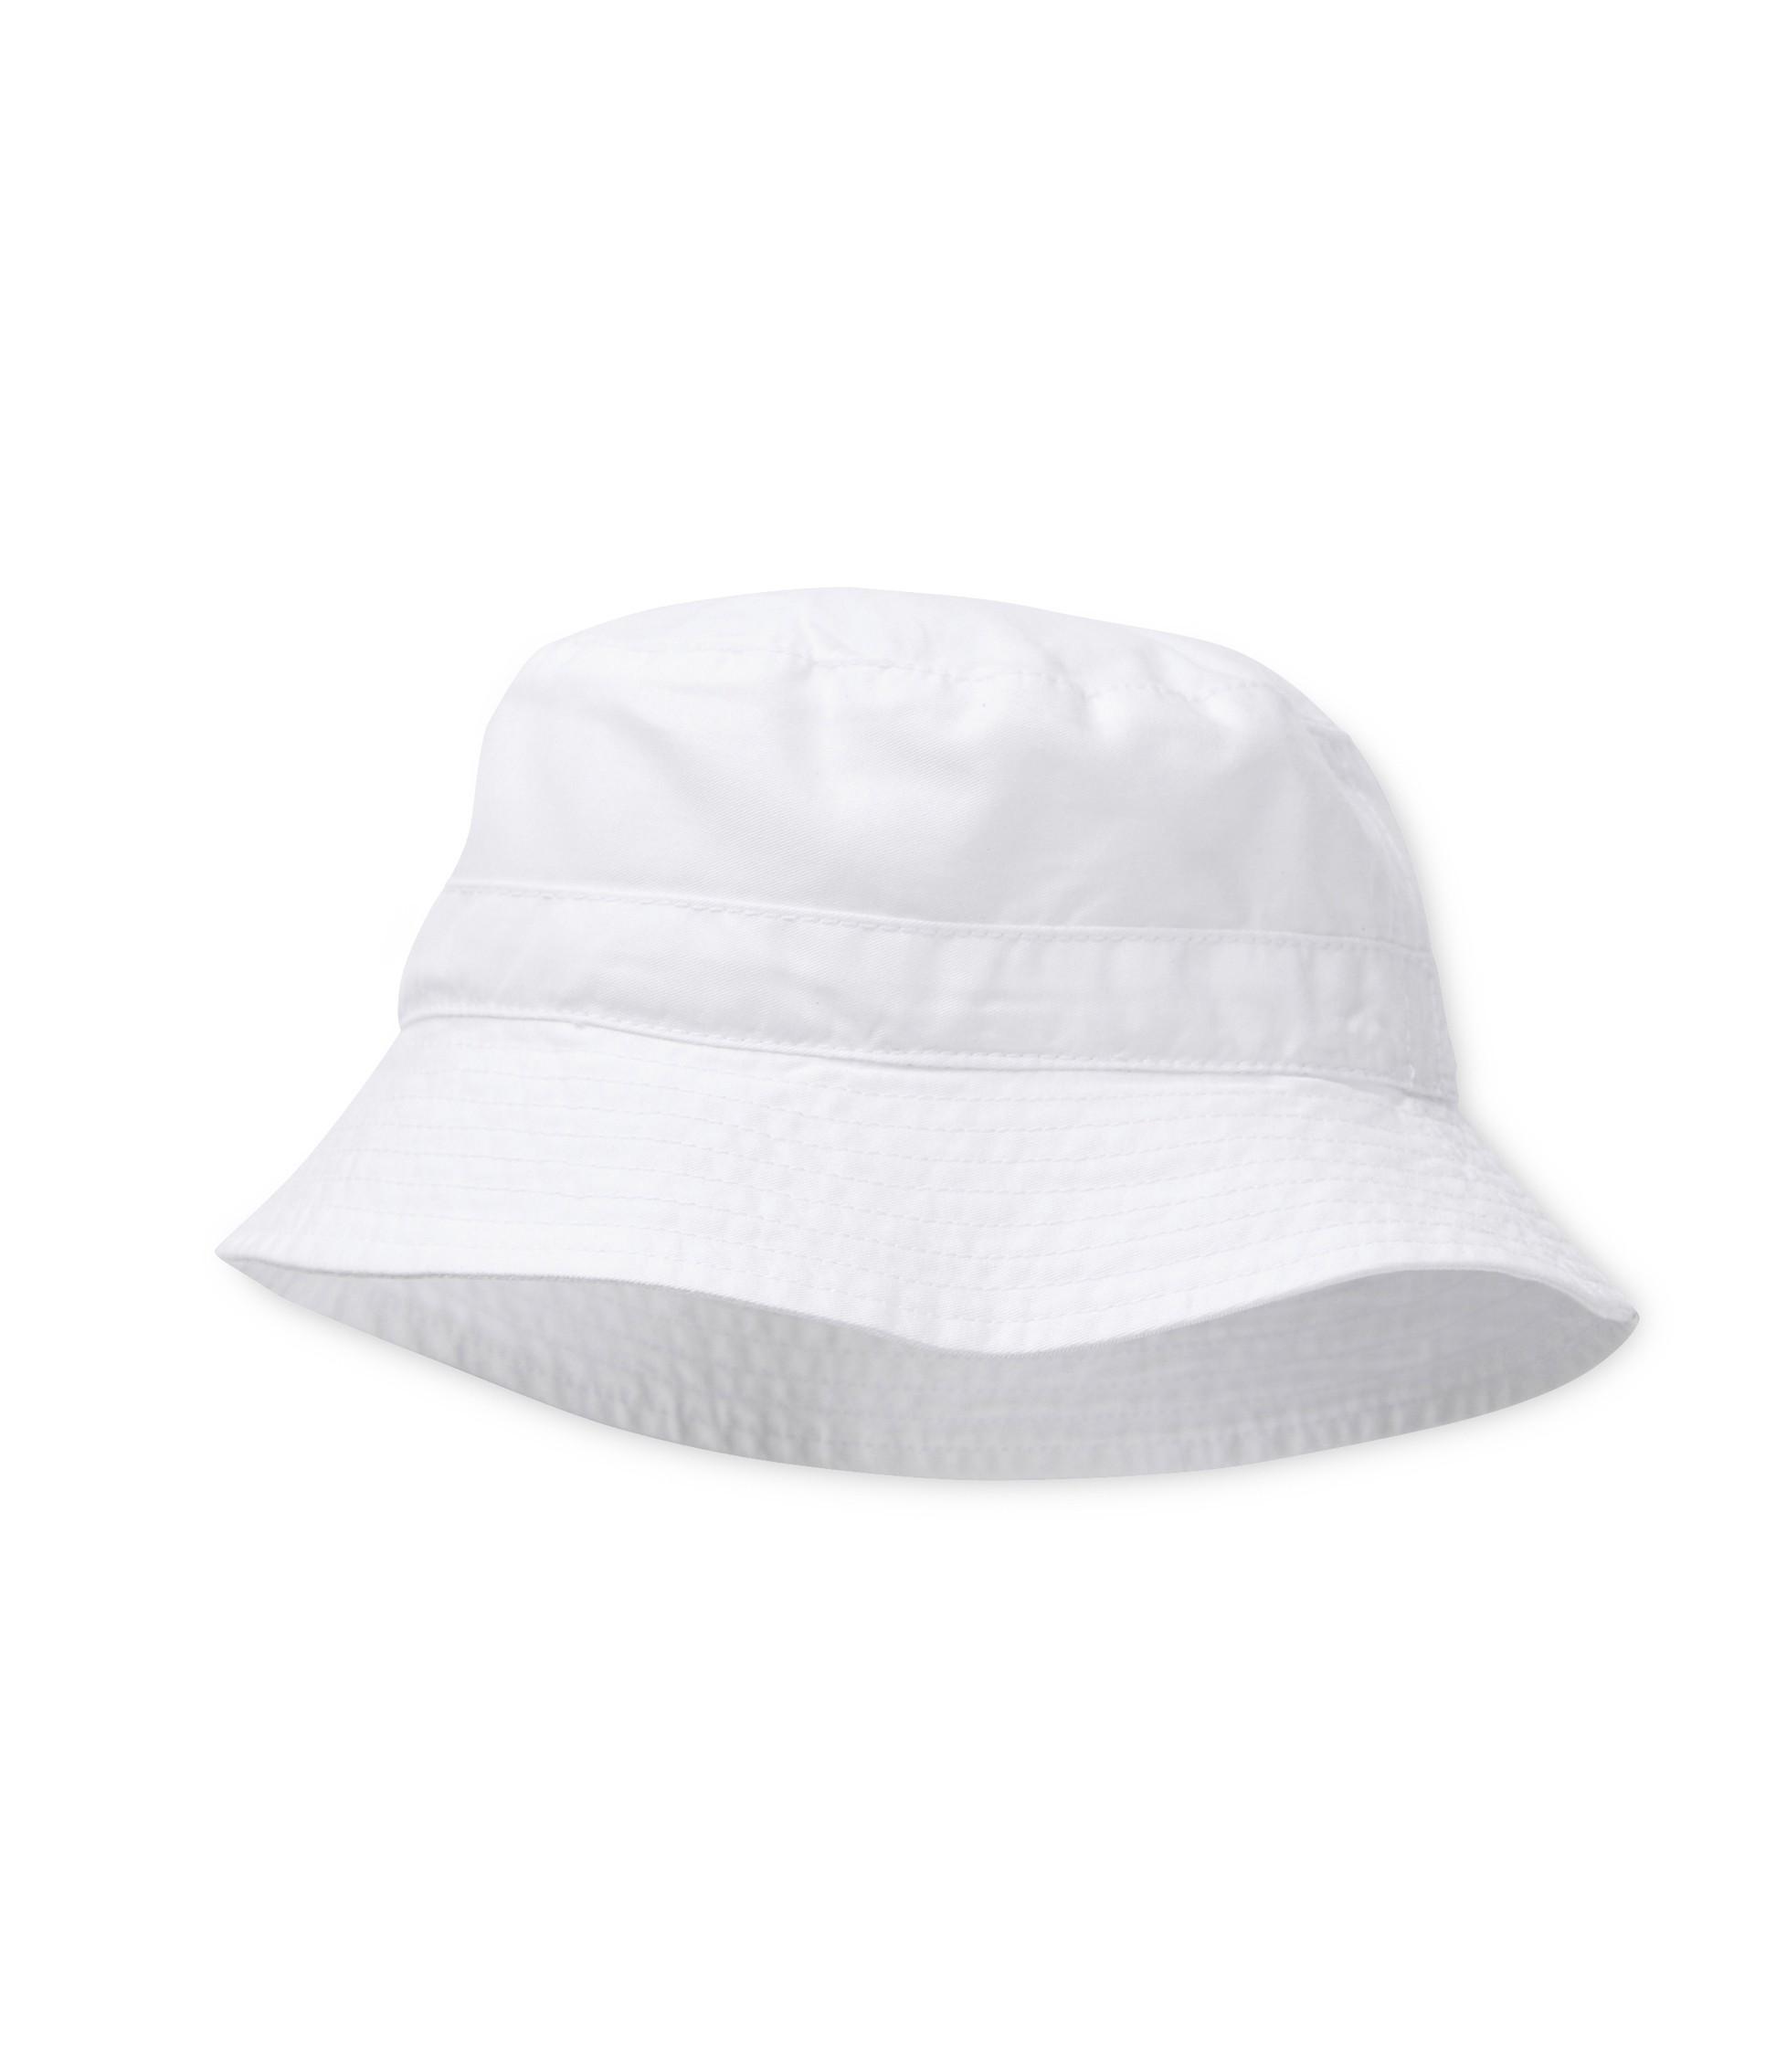 Baby boy bucket hat in plain serge - petit-bateau.gr 13da4beacb5